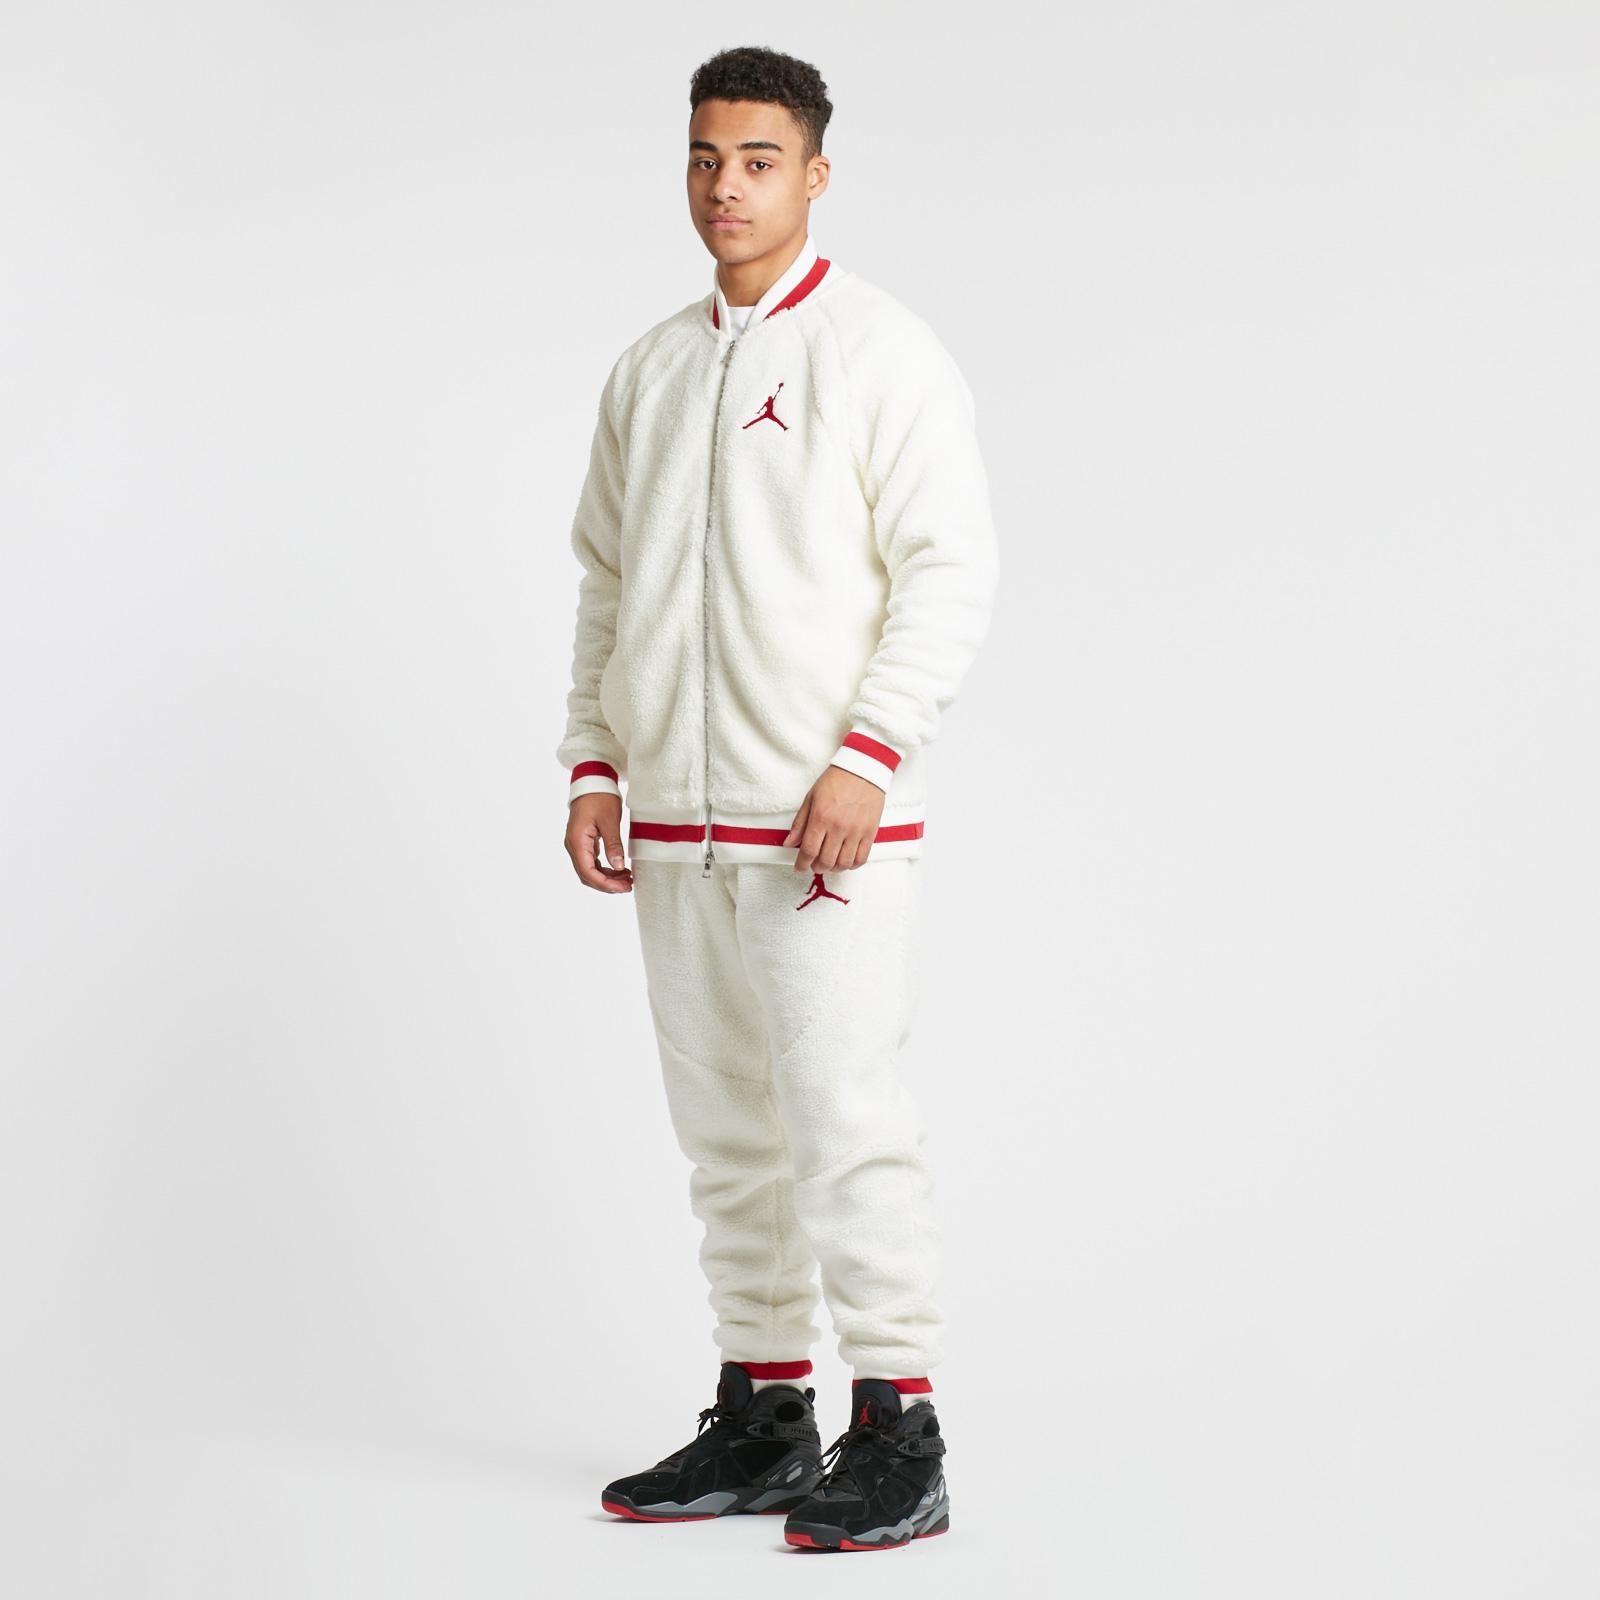 competitive price fedb5 3f13b Jordan Brand Shearling AJ1 Fleece Jacket - 6. Close